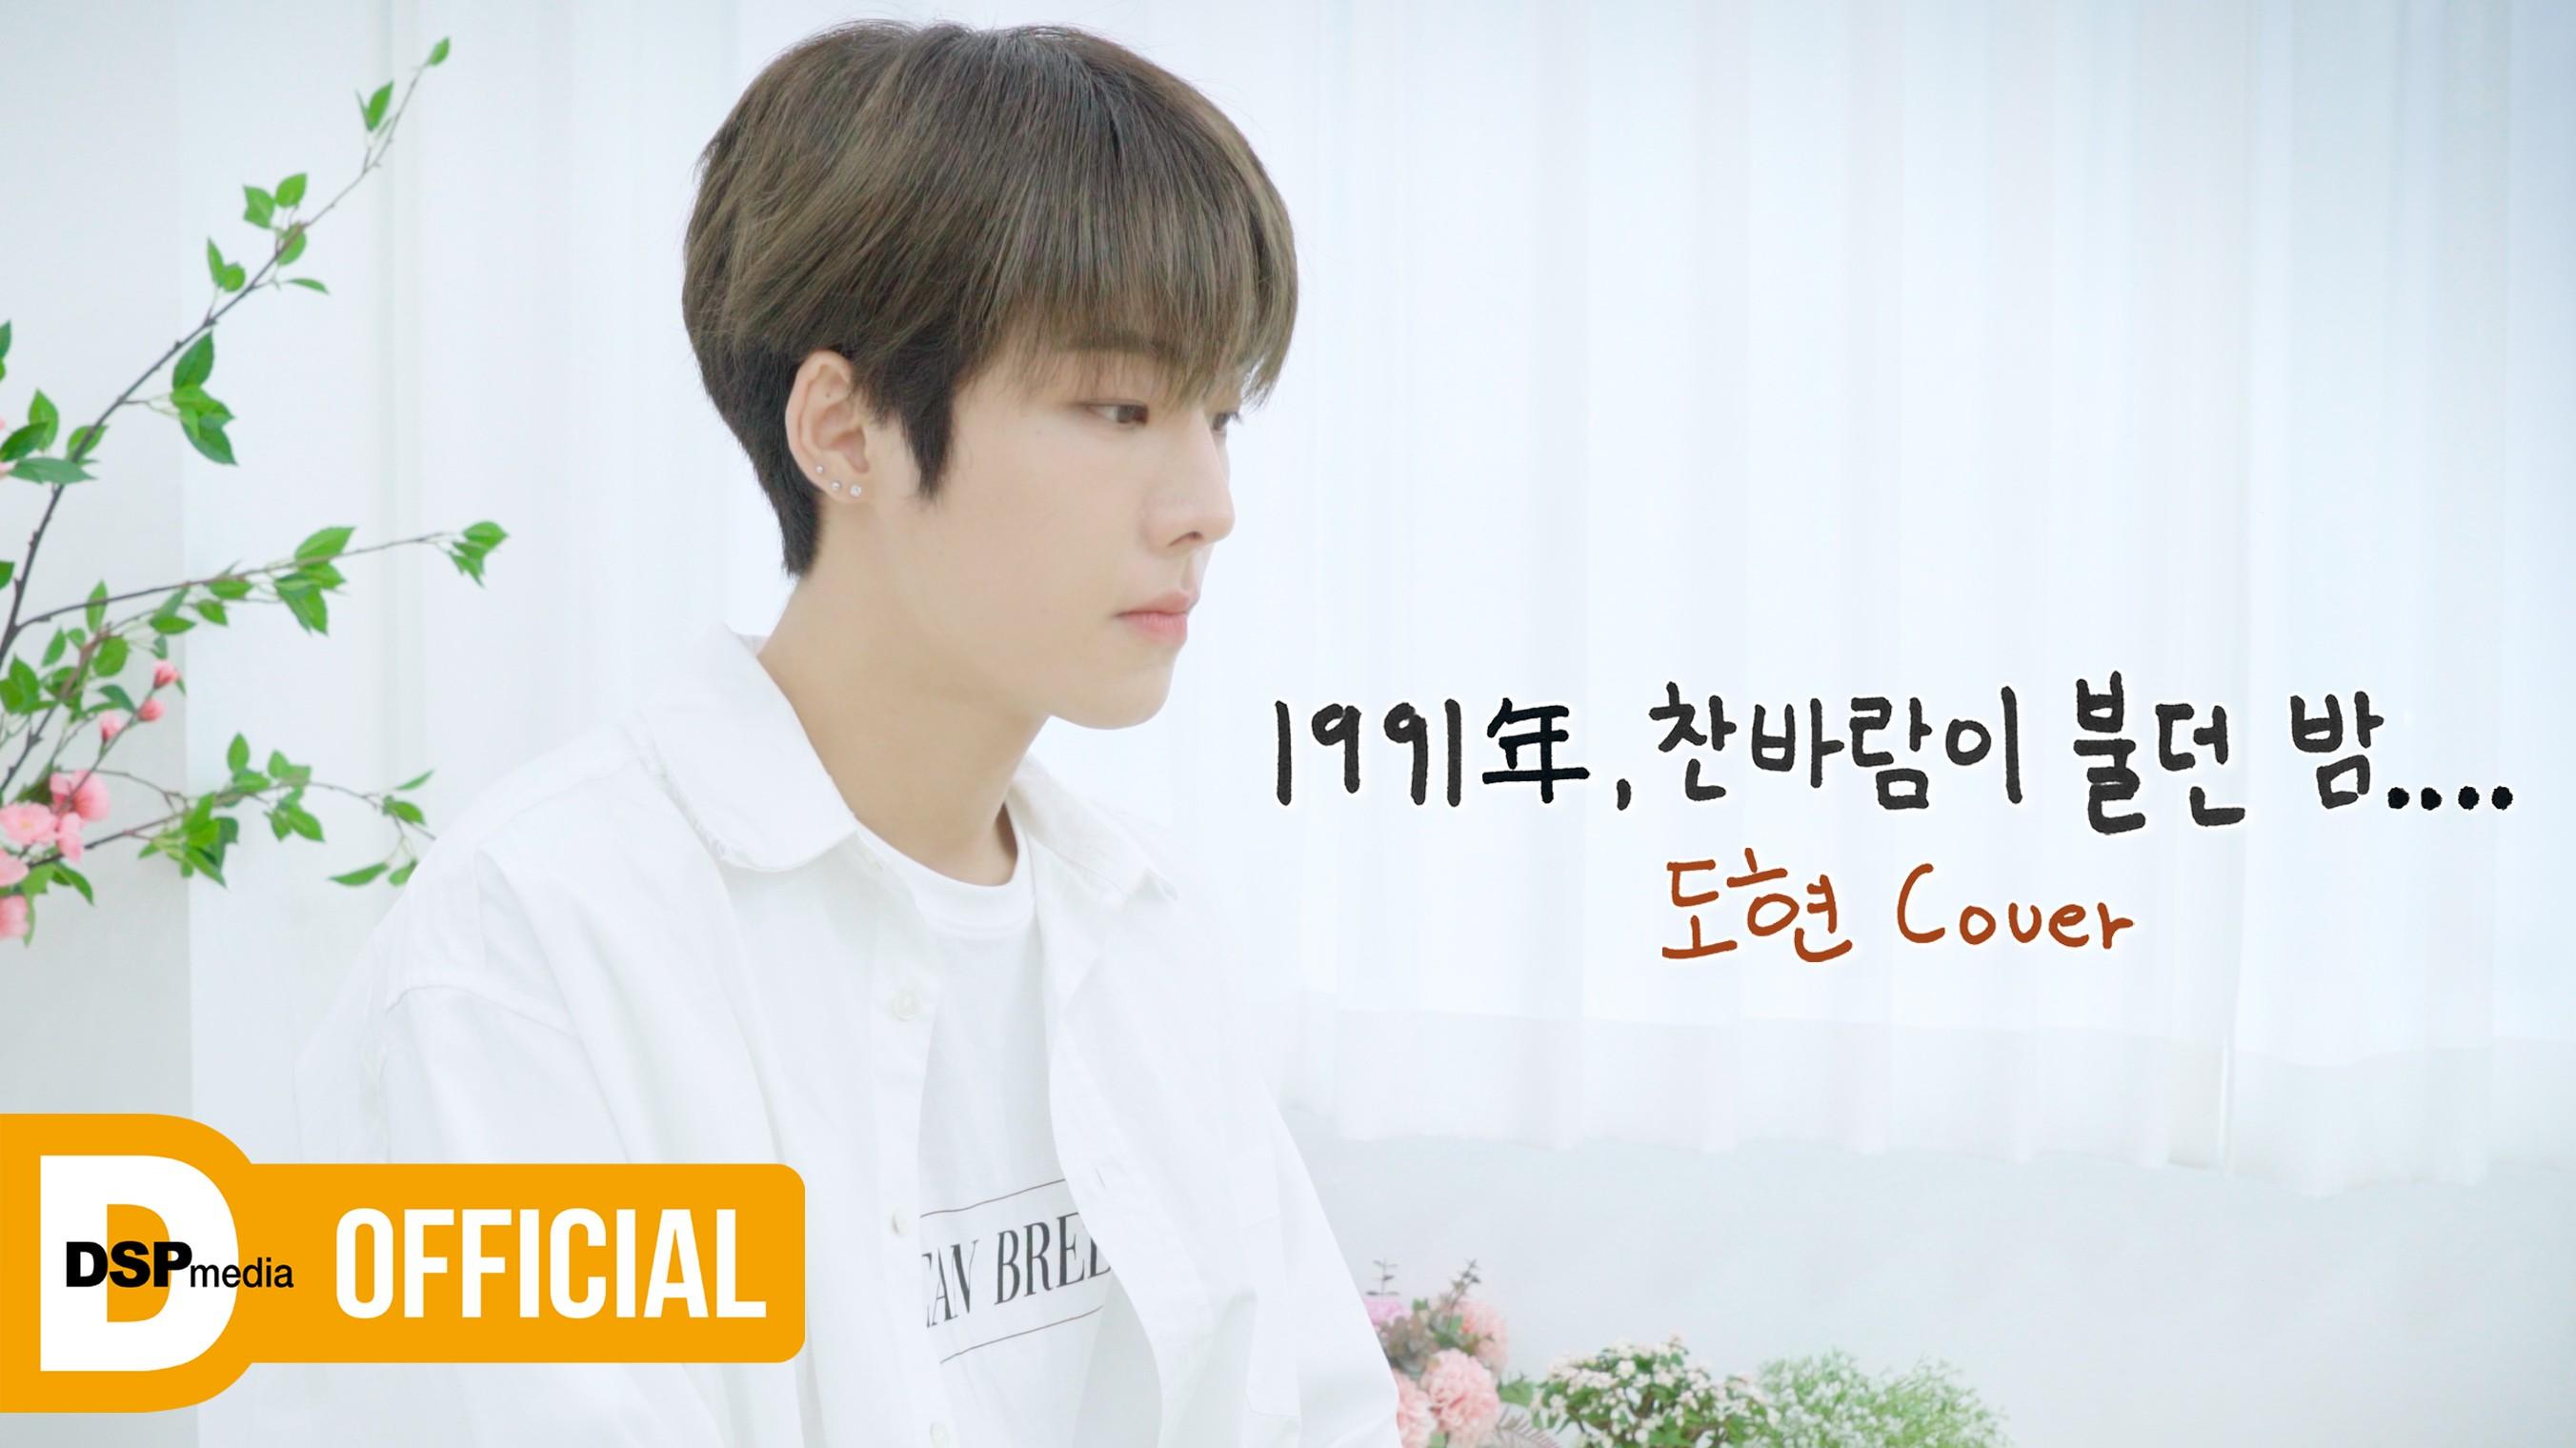 [COVER] 박효신 - 1991年, 찬바람이 불던 밤.... │ 미래소년  유도현 (MIRAE YOODOUHYUN)